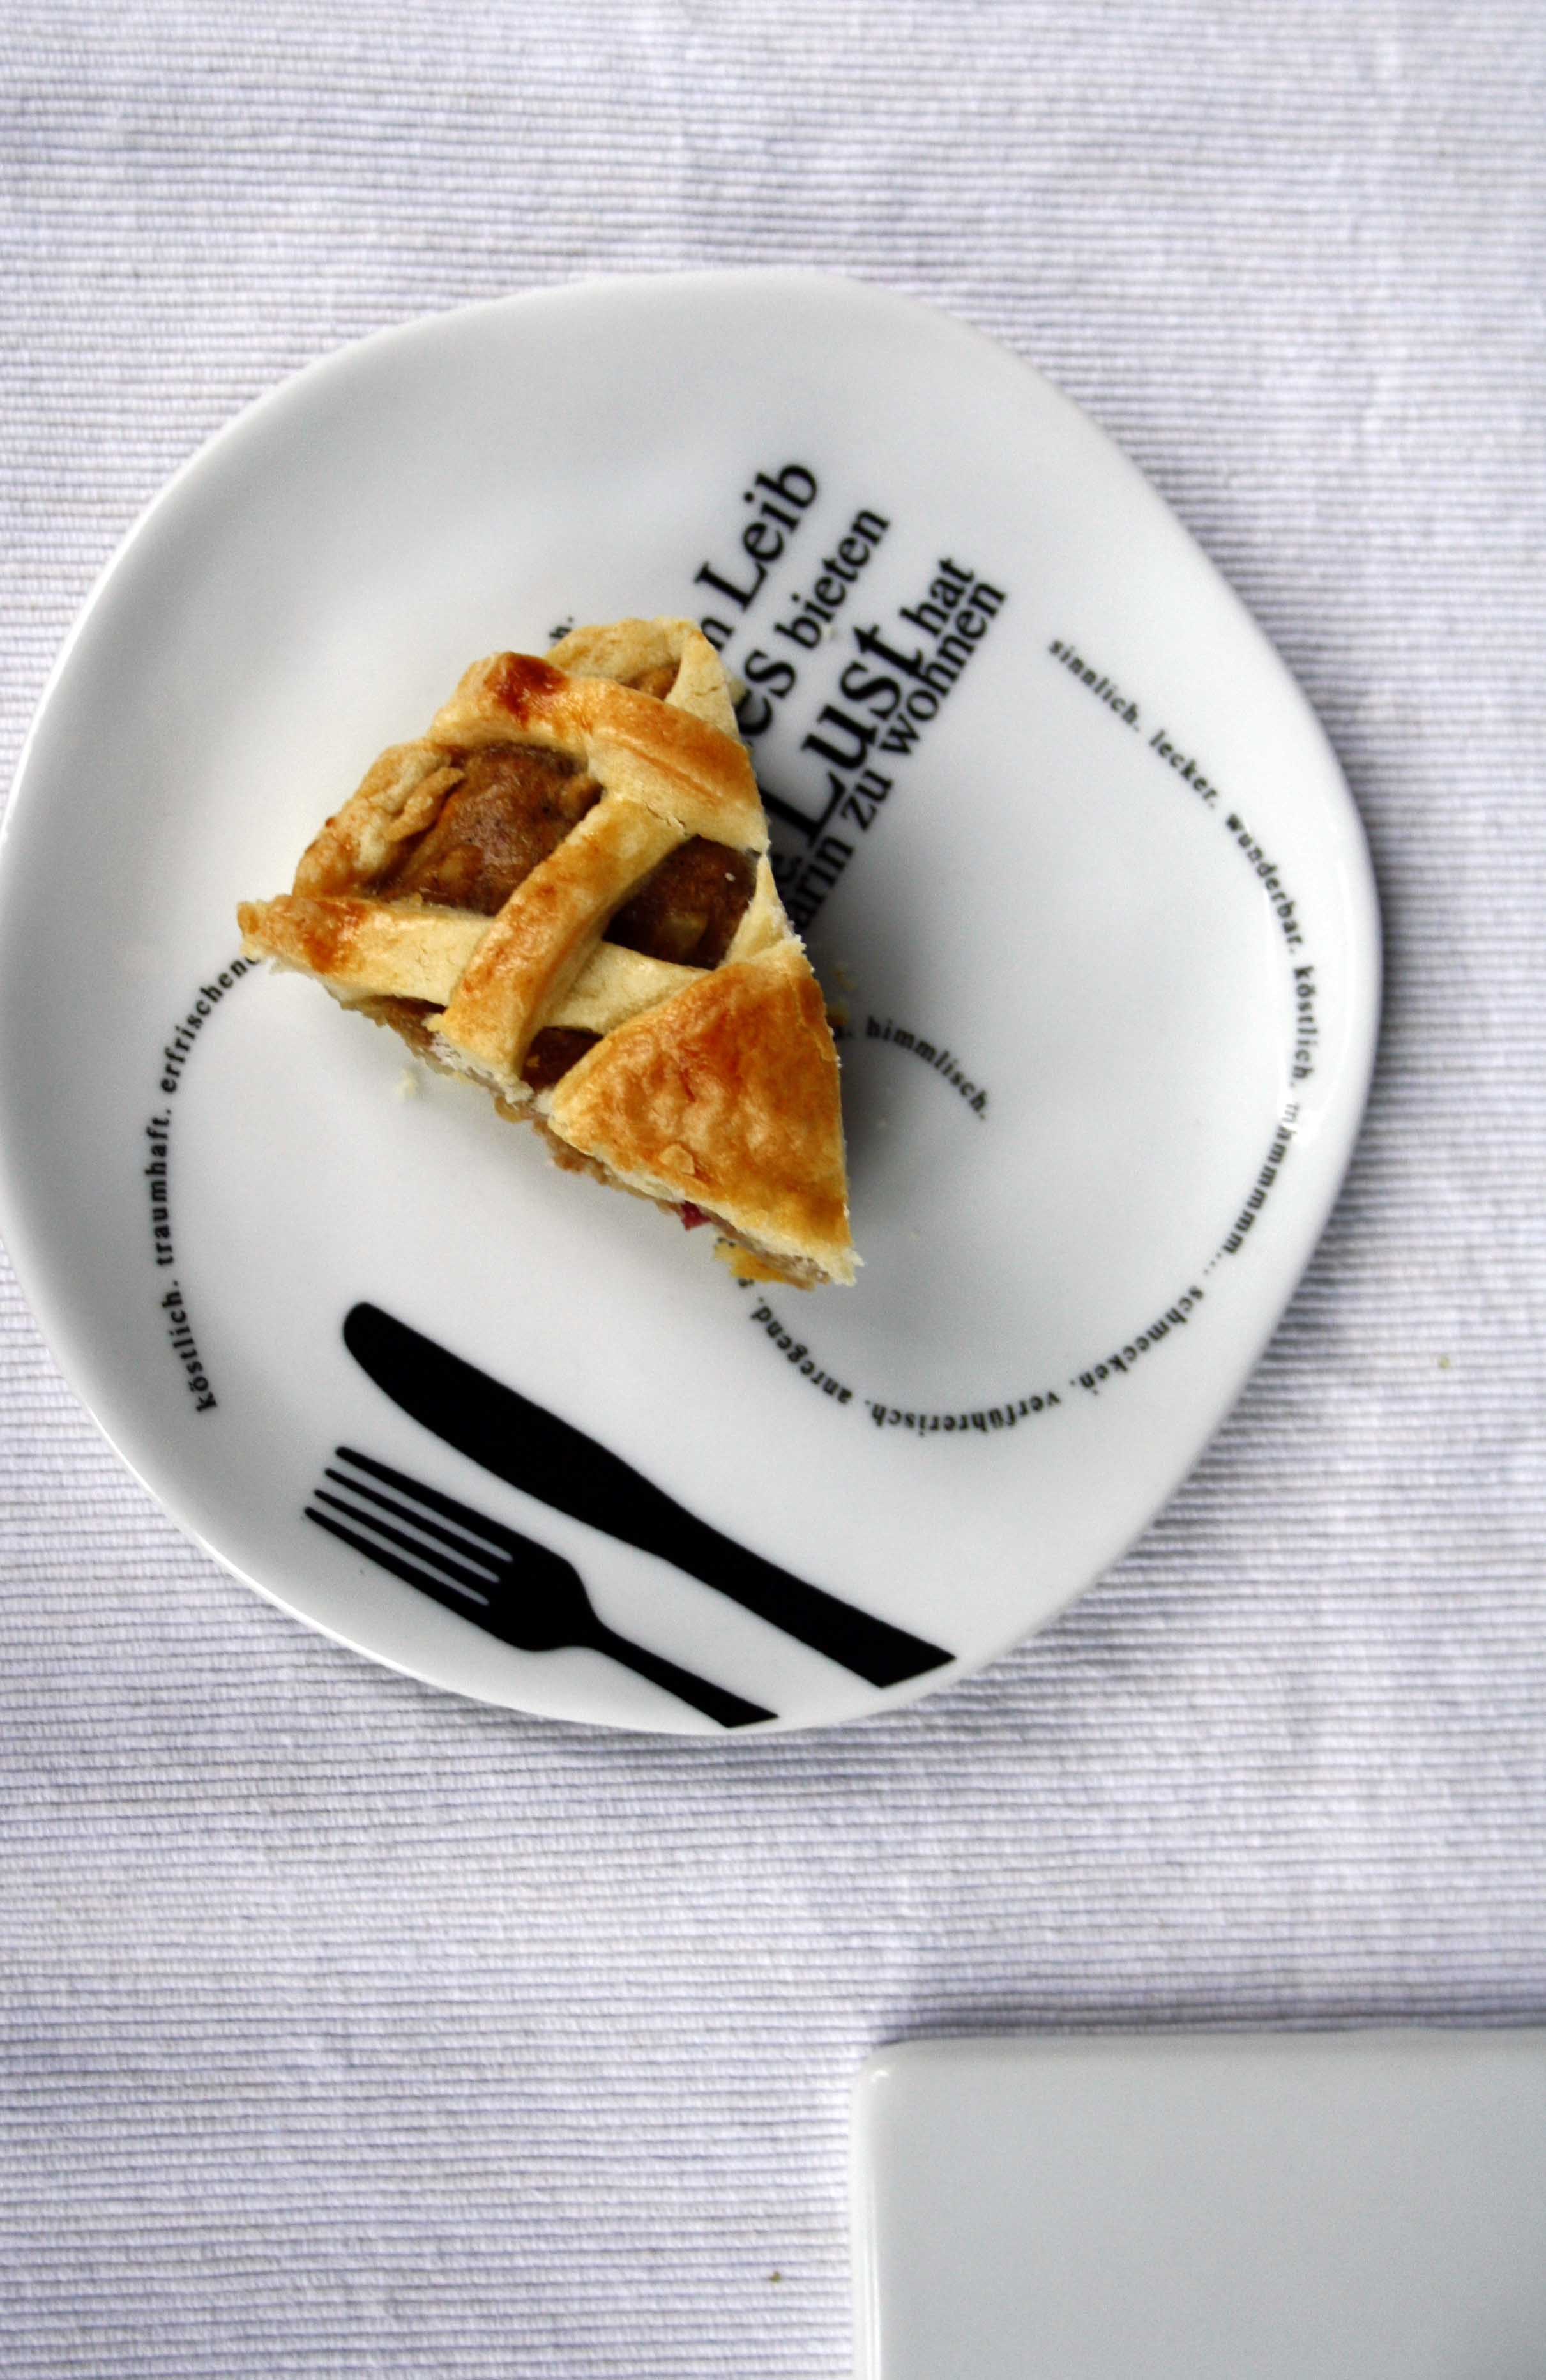 Apple-Pie-Pastete // Apple Pie by http://babyrockmyday.com/apple-pie-pastete/